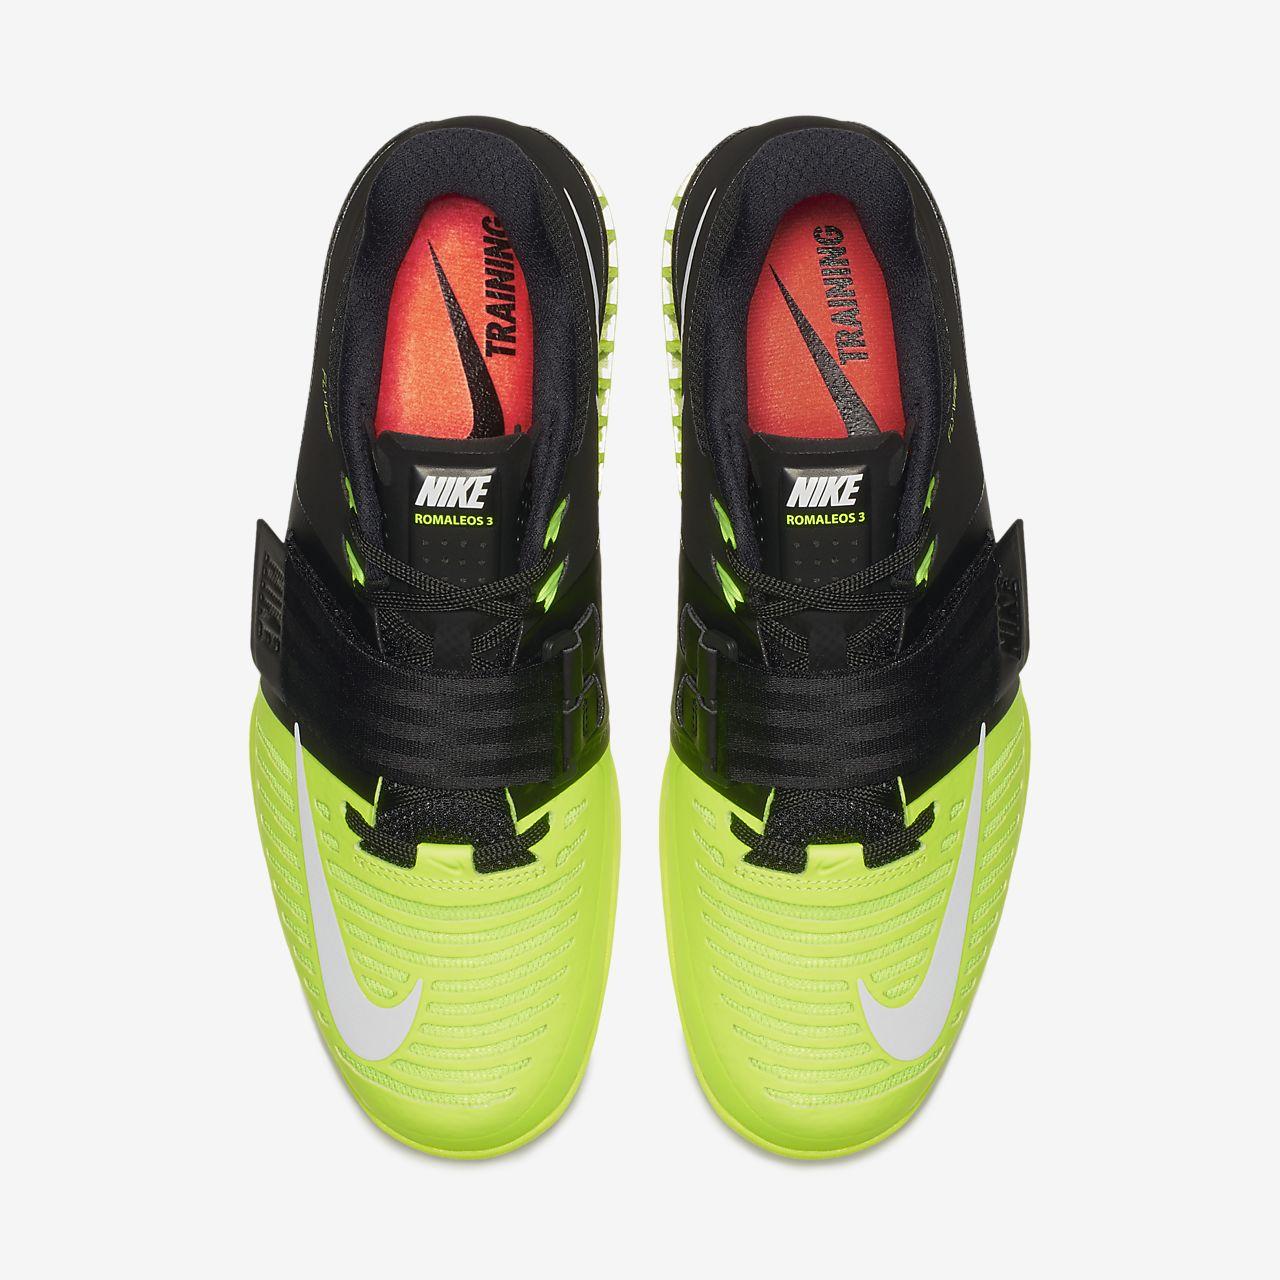 Nike Romaleos 3 Gewichtheberschuh